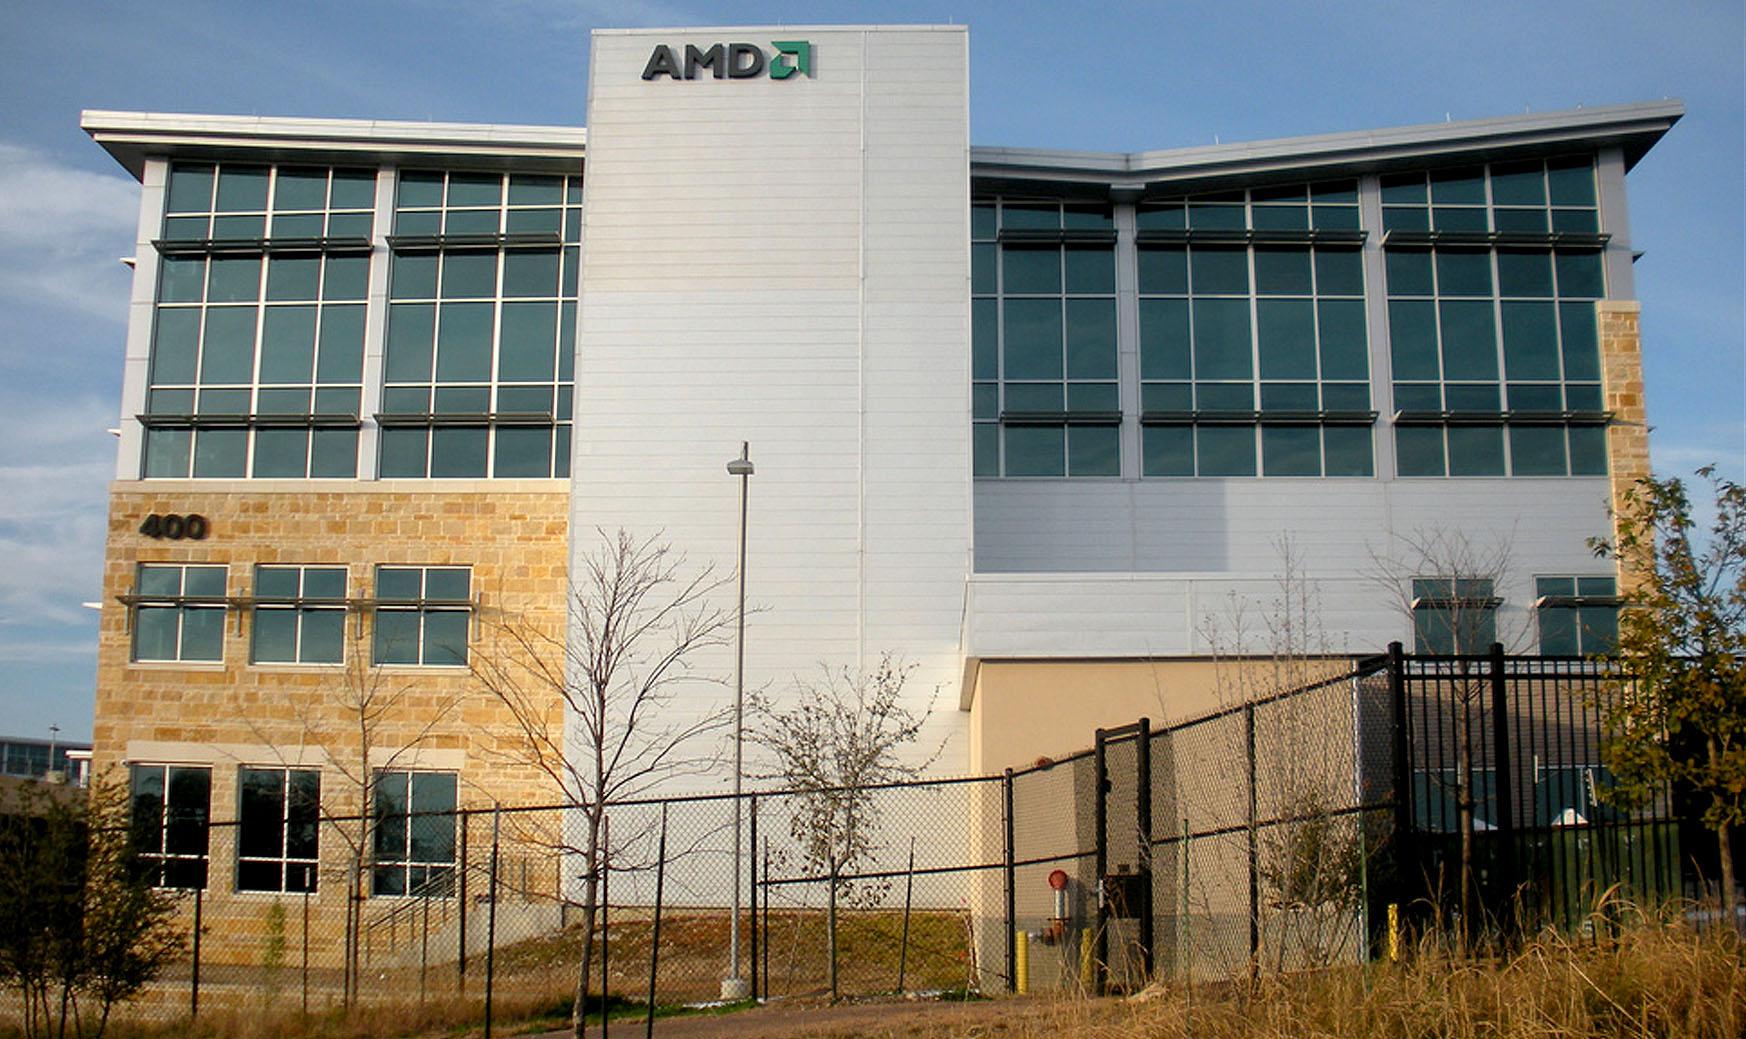 AMD South Campus